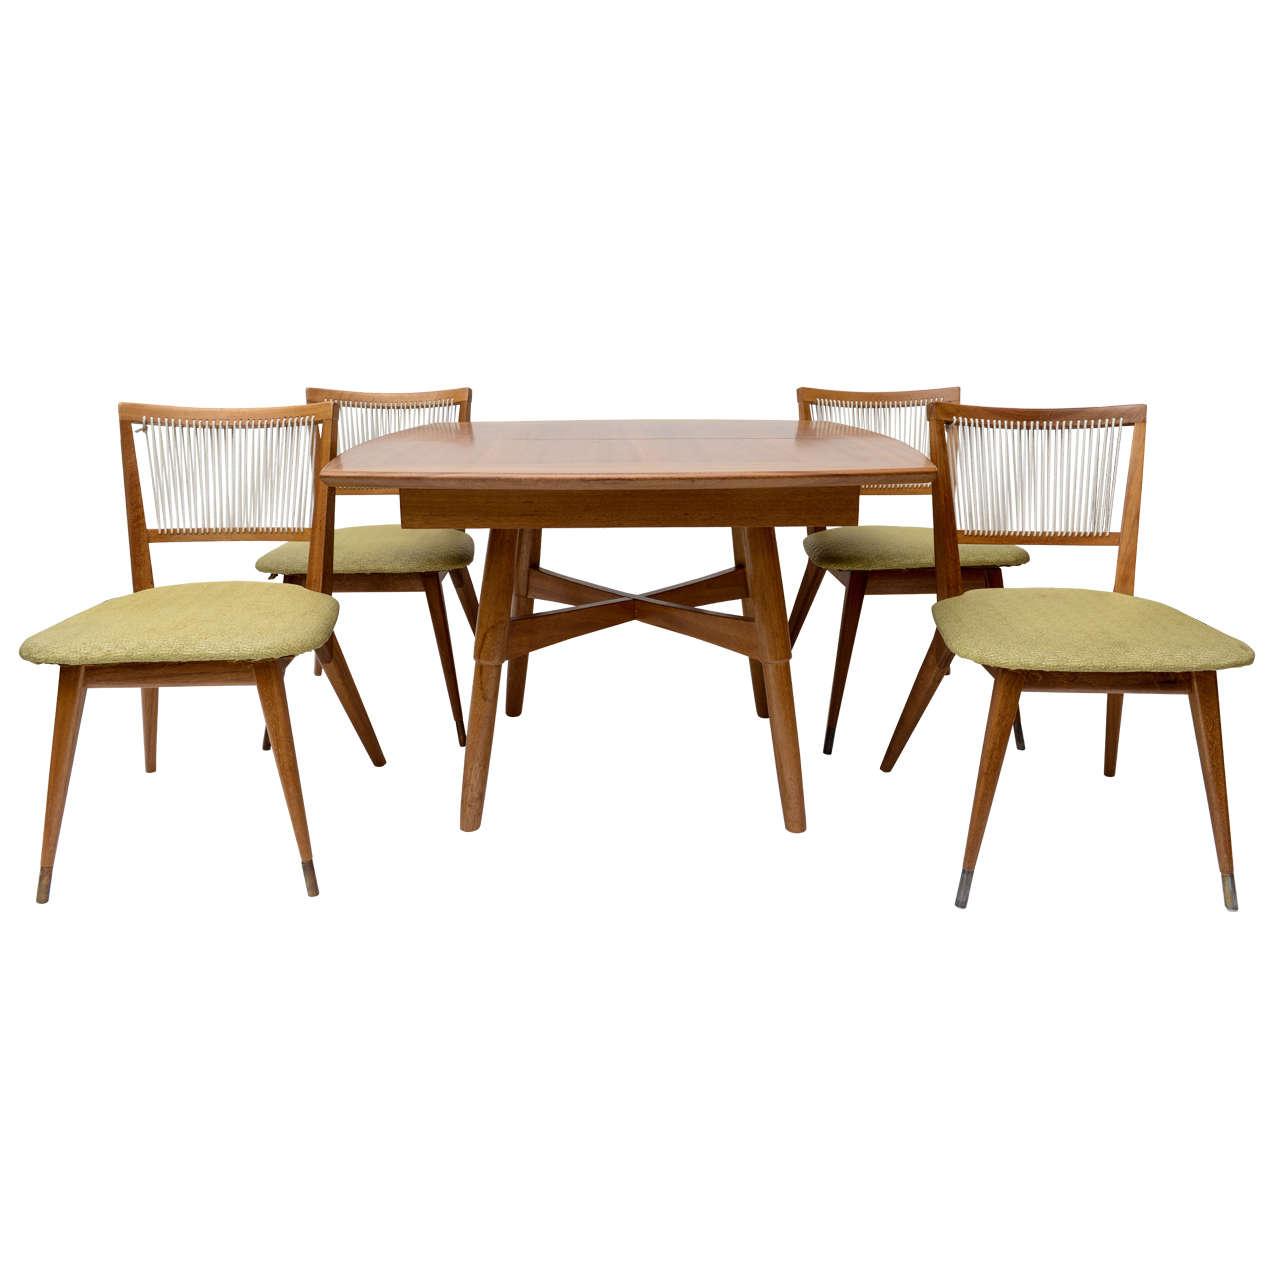 John keal for brown saltman dining table and chairs at 1stdibs for Brown dining table set